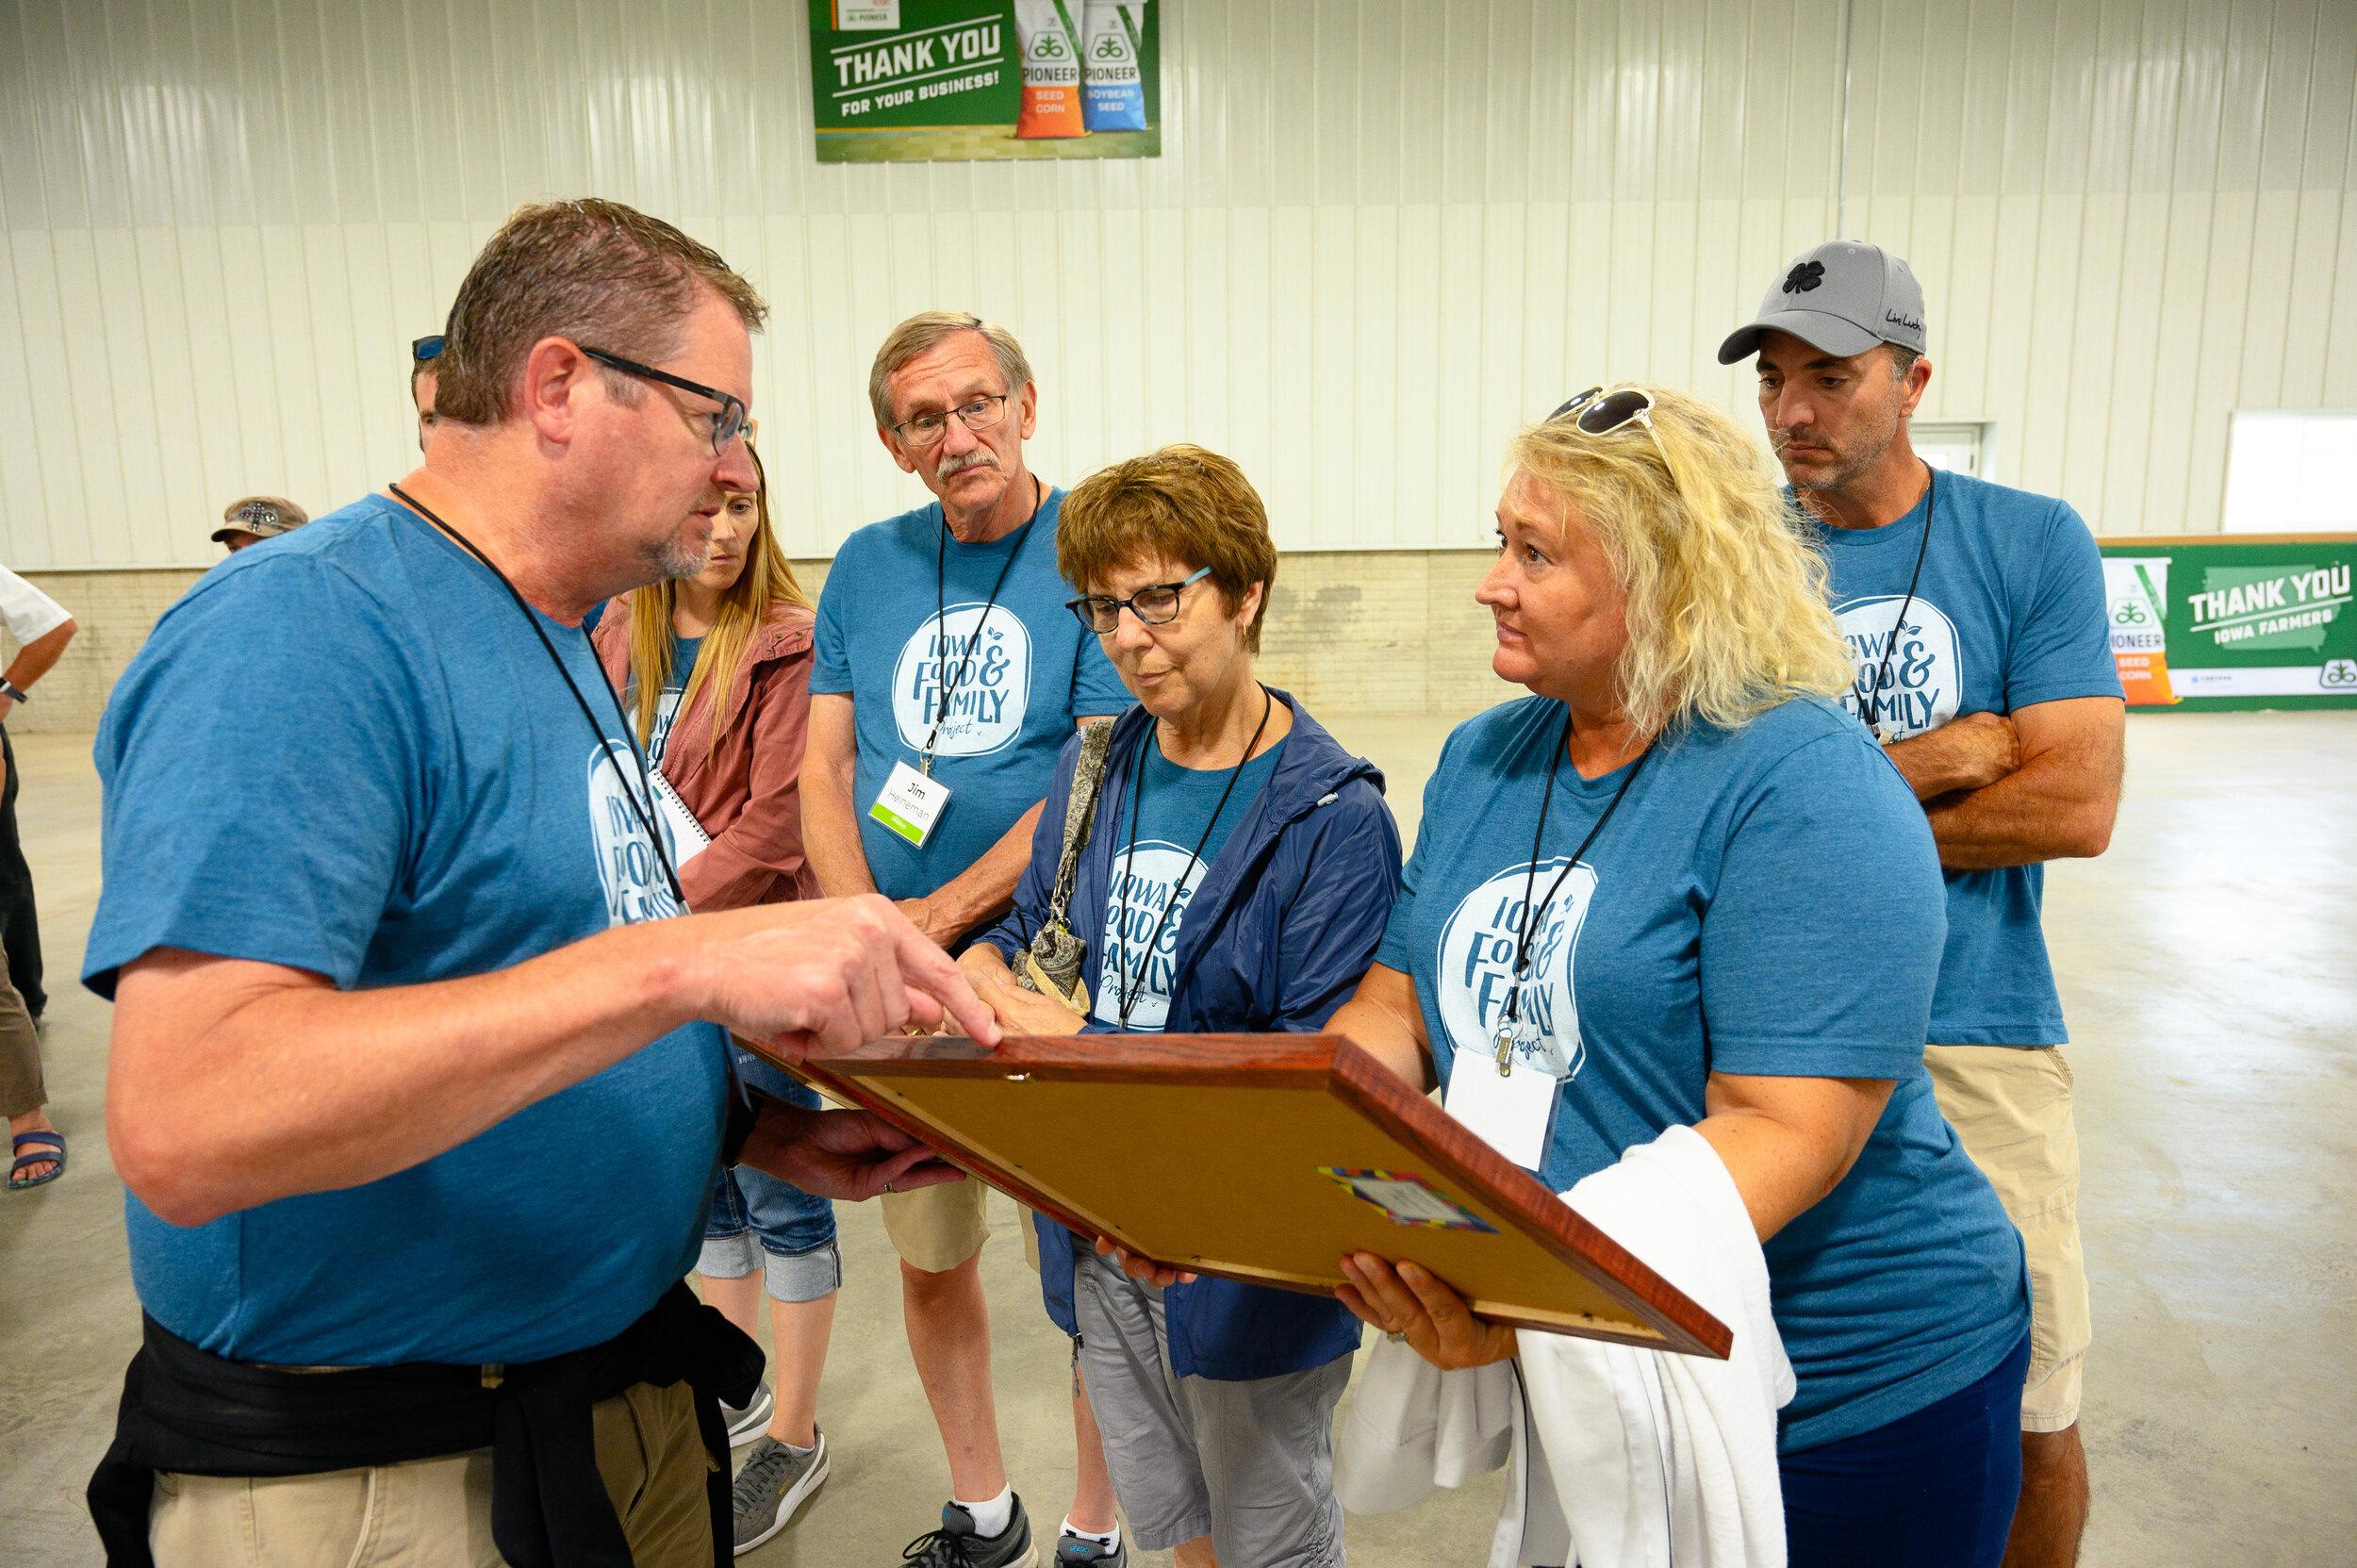 Participants learn about the family's history of farming near Lytton. Photo credit: Joseph L. Murphy/Iowa Soybean Association